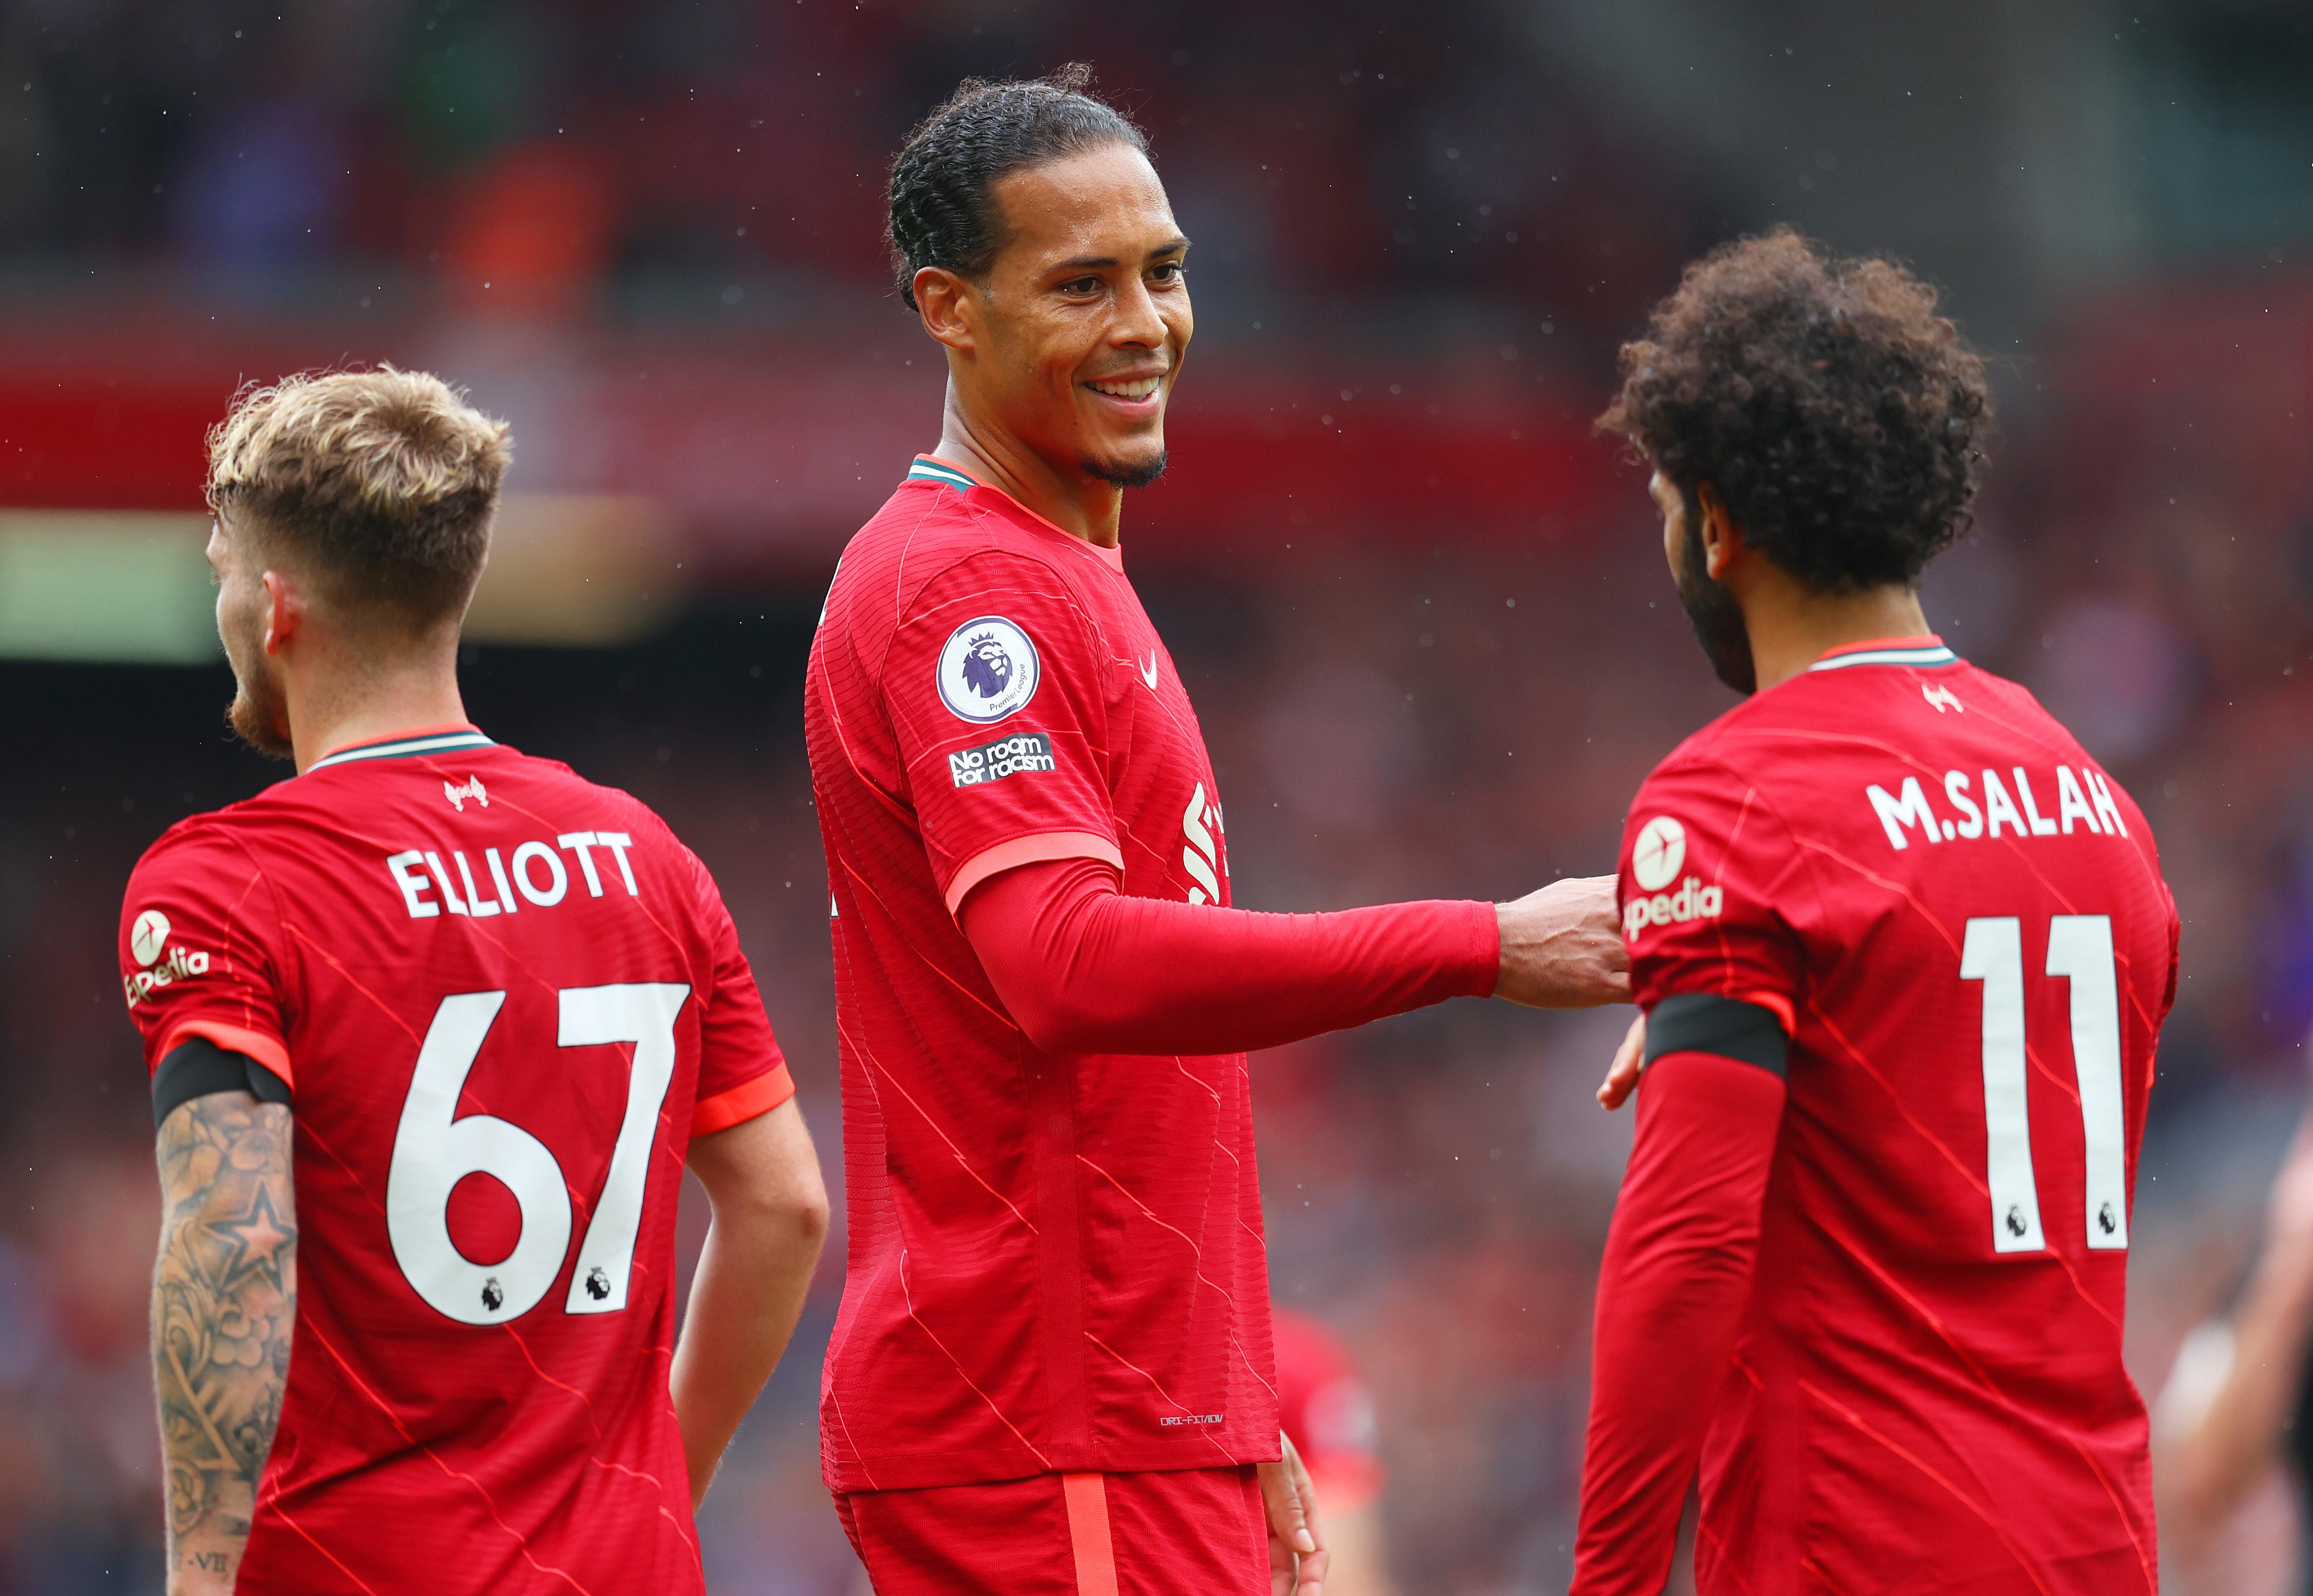 Mo Salah of Liverpool celebrates a goal with Virgil van Dijk - Liverpool - Premier League